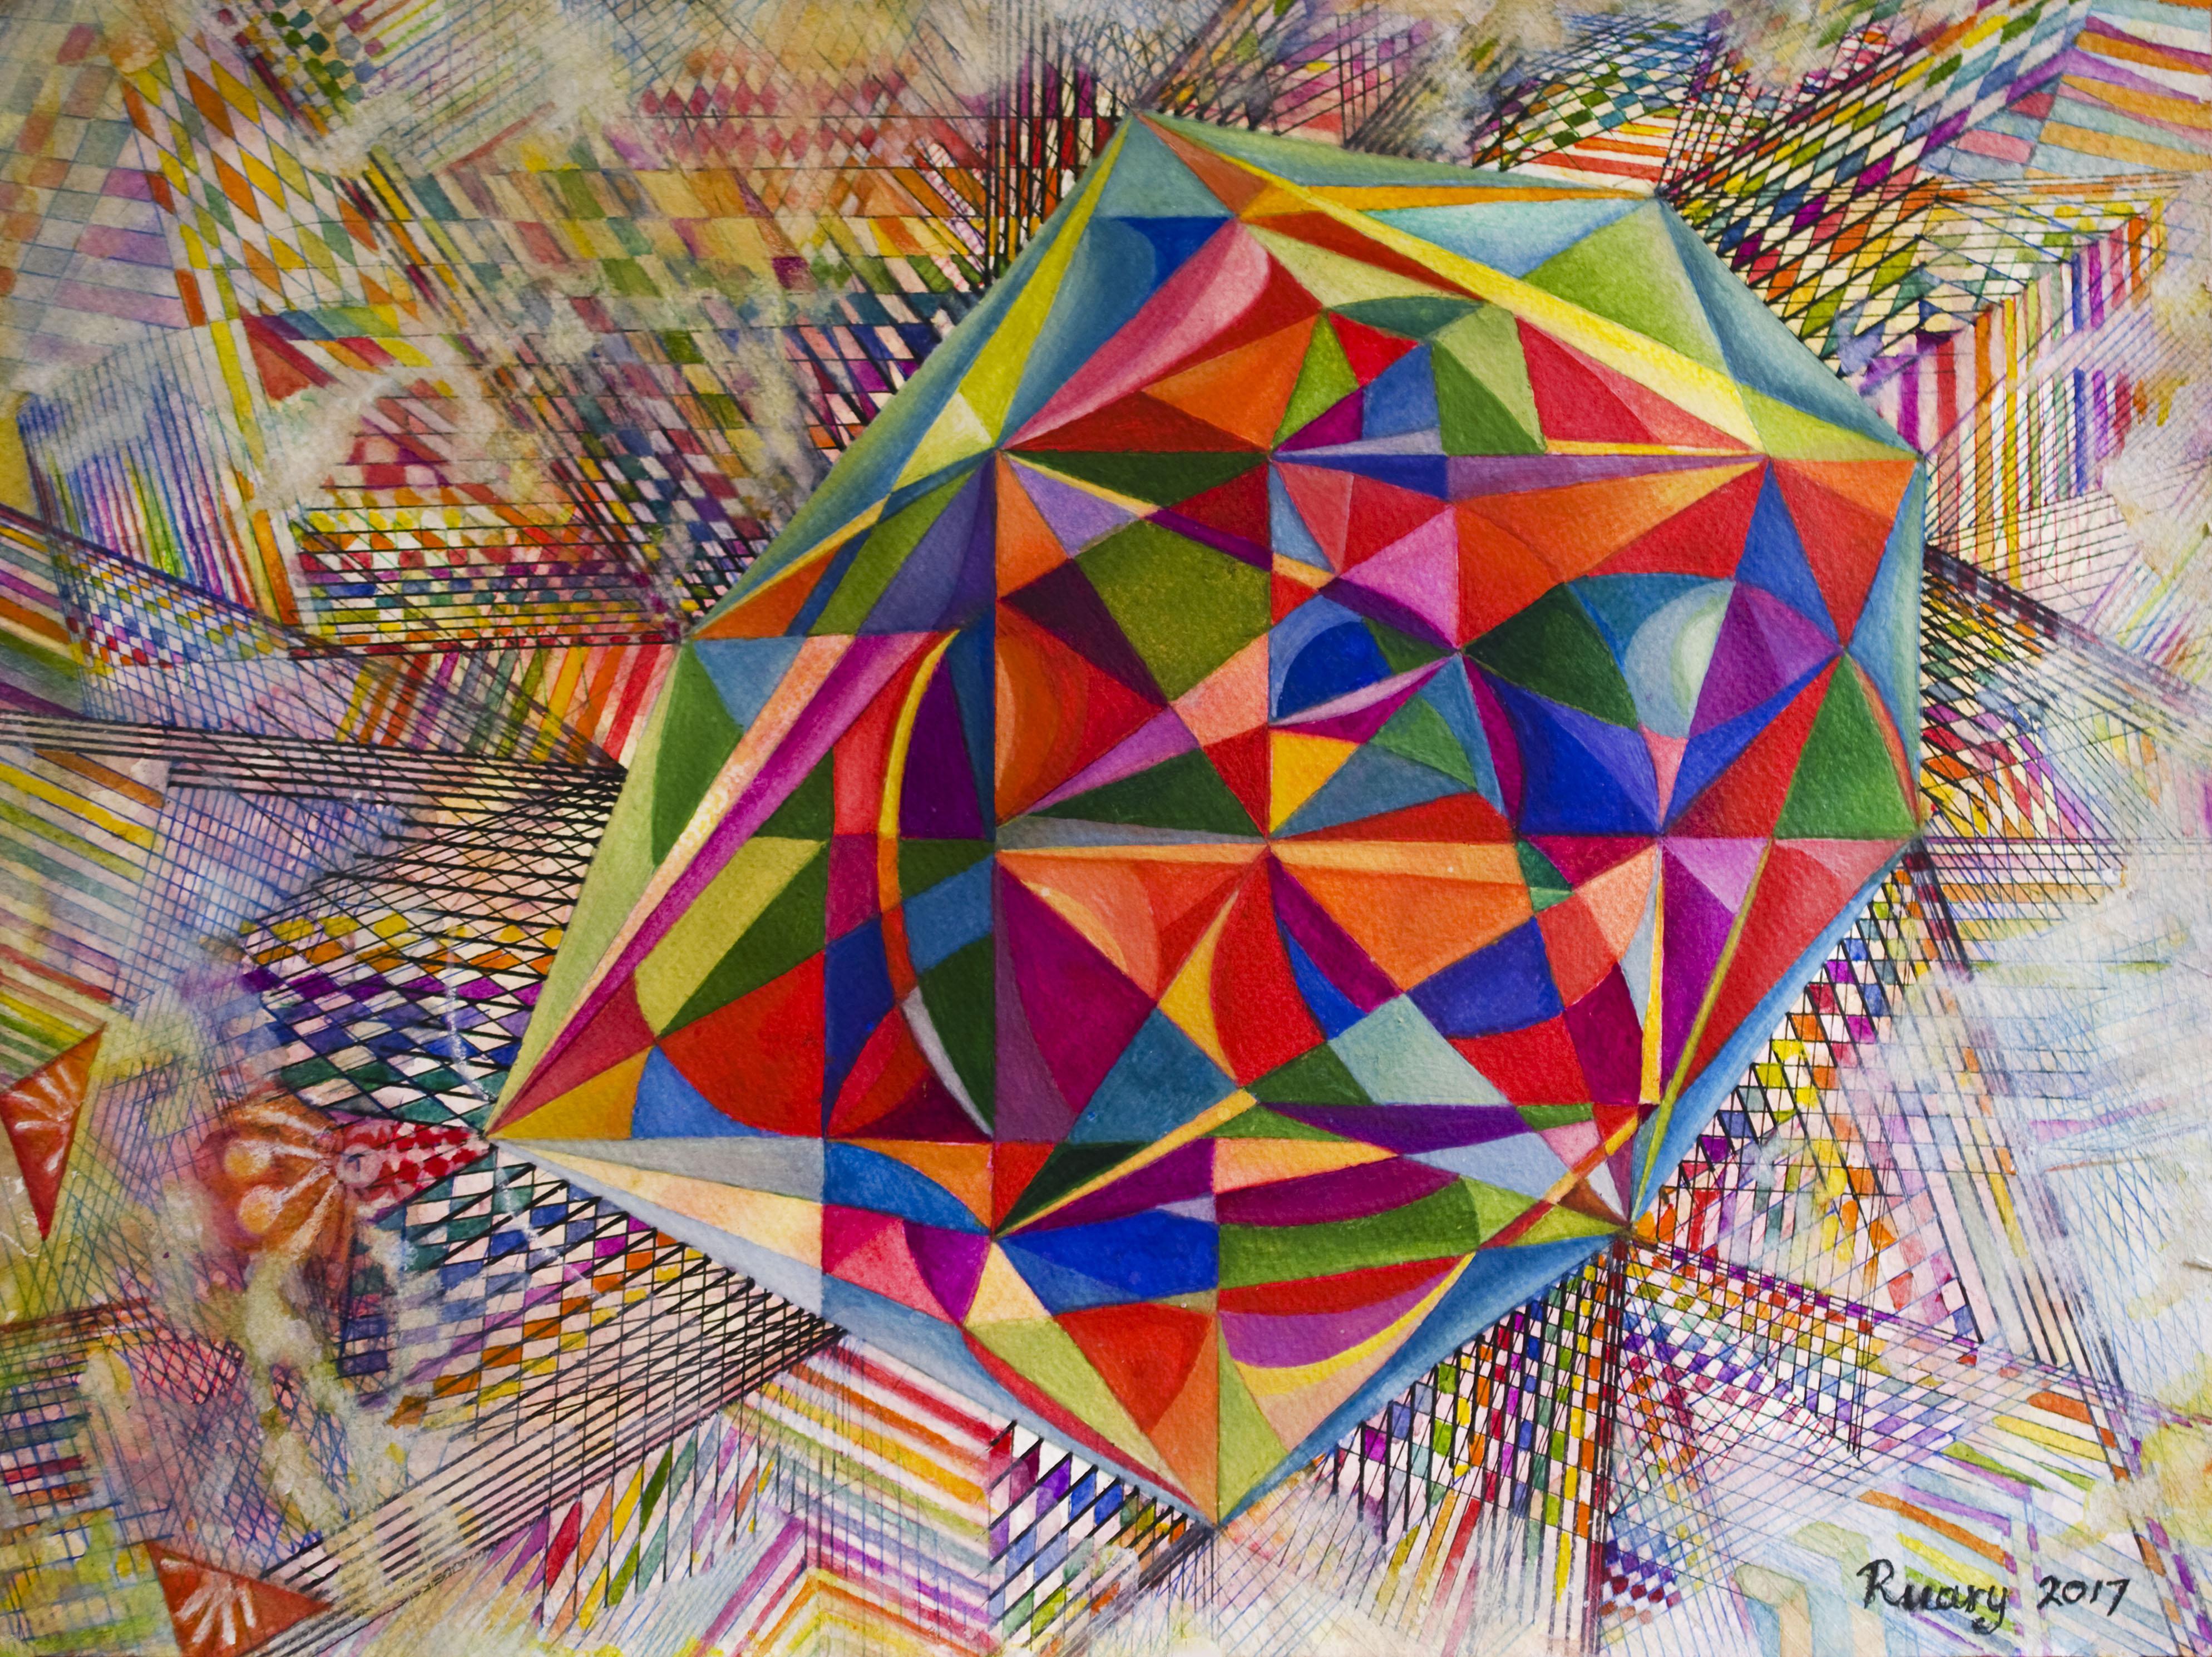 Virystal (2017), compass construction, pen and watercolour on A3 paper. Butleigh, England